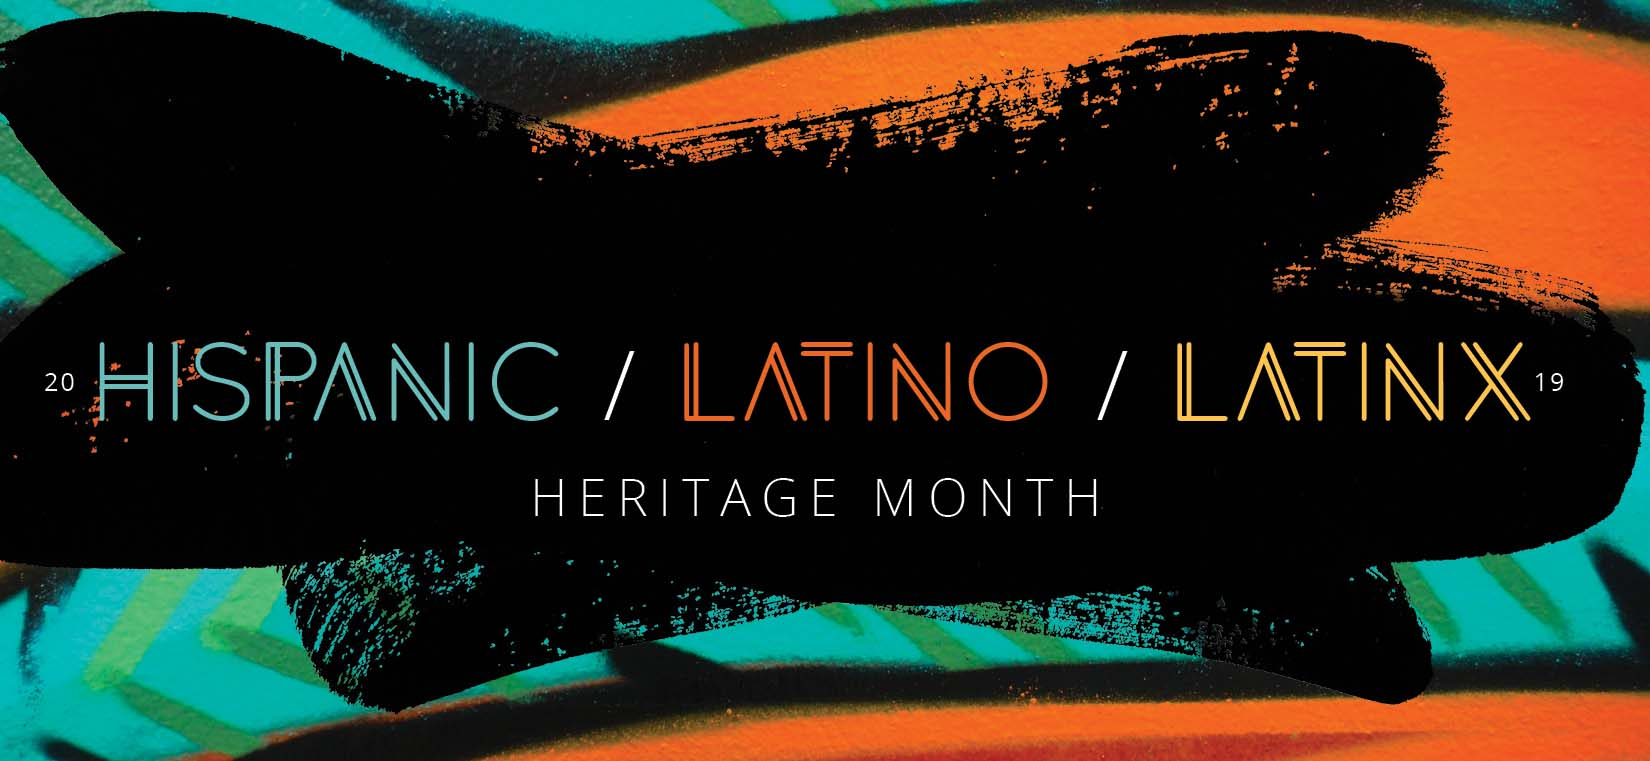 Hispanic/Latino/Latinx Heritage Month Banner